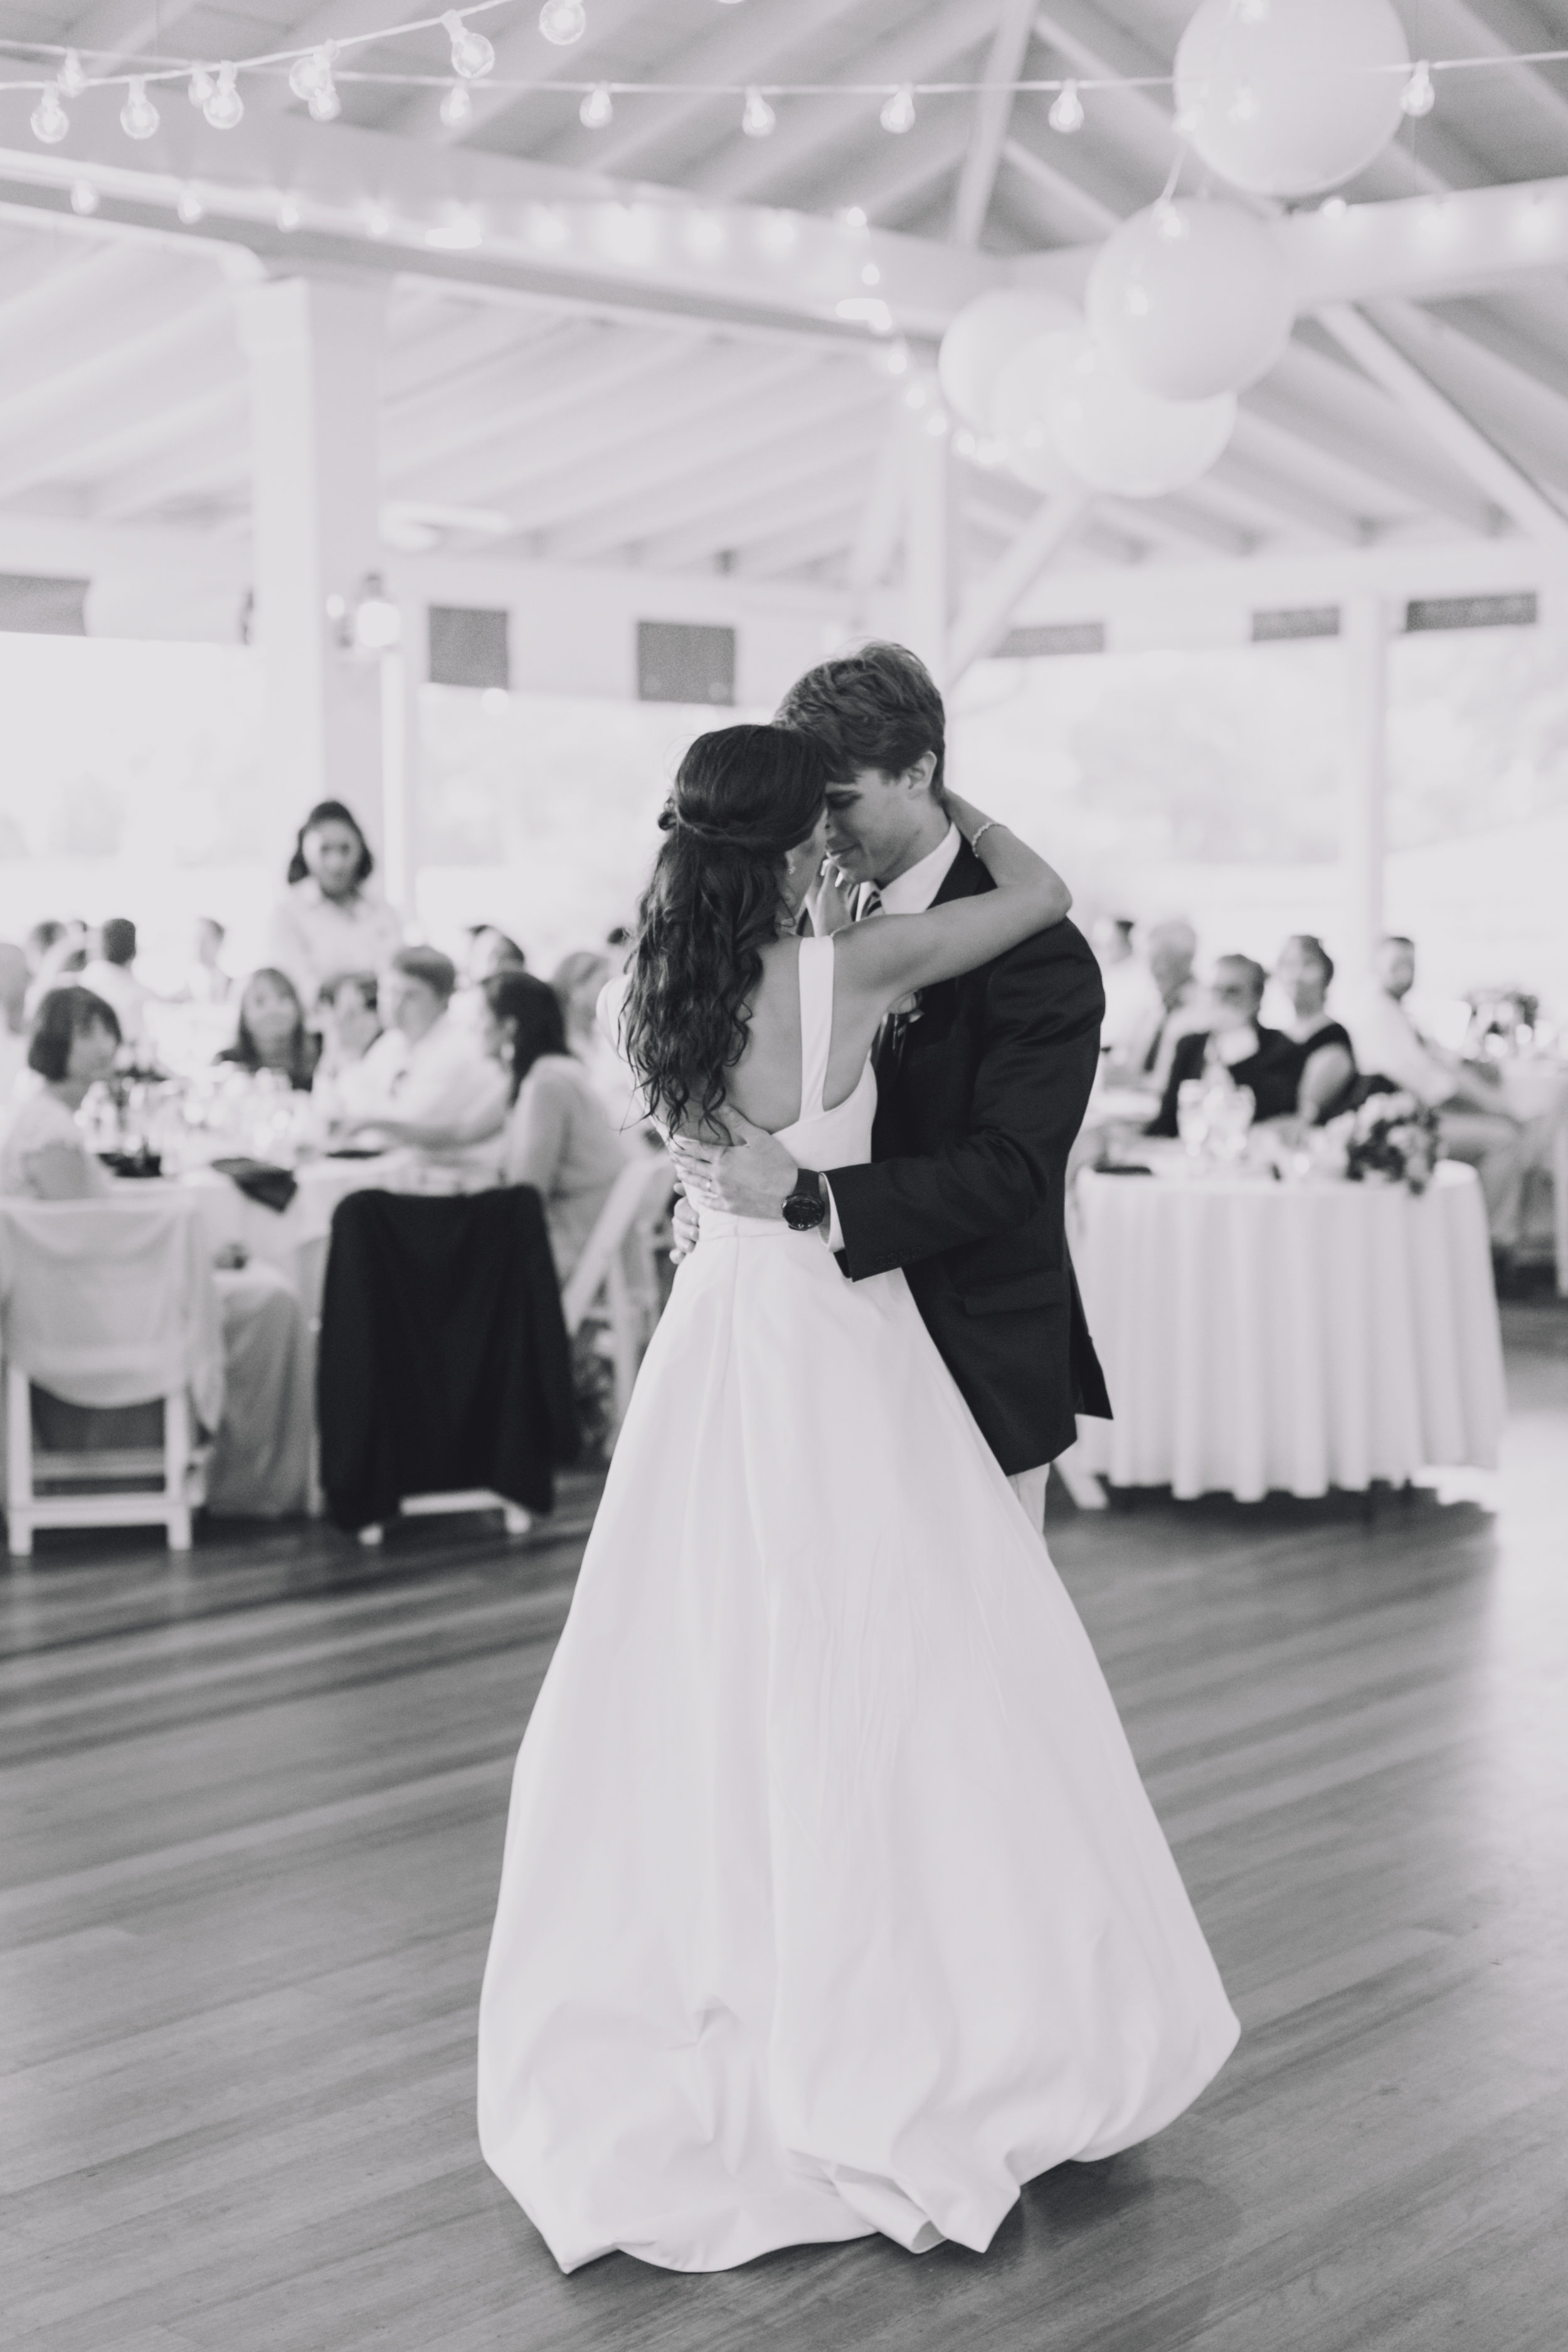 Madeleine_Matt_Wedding_Slideshow_Jpegs-170.jpg